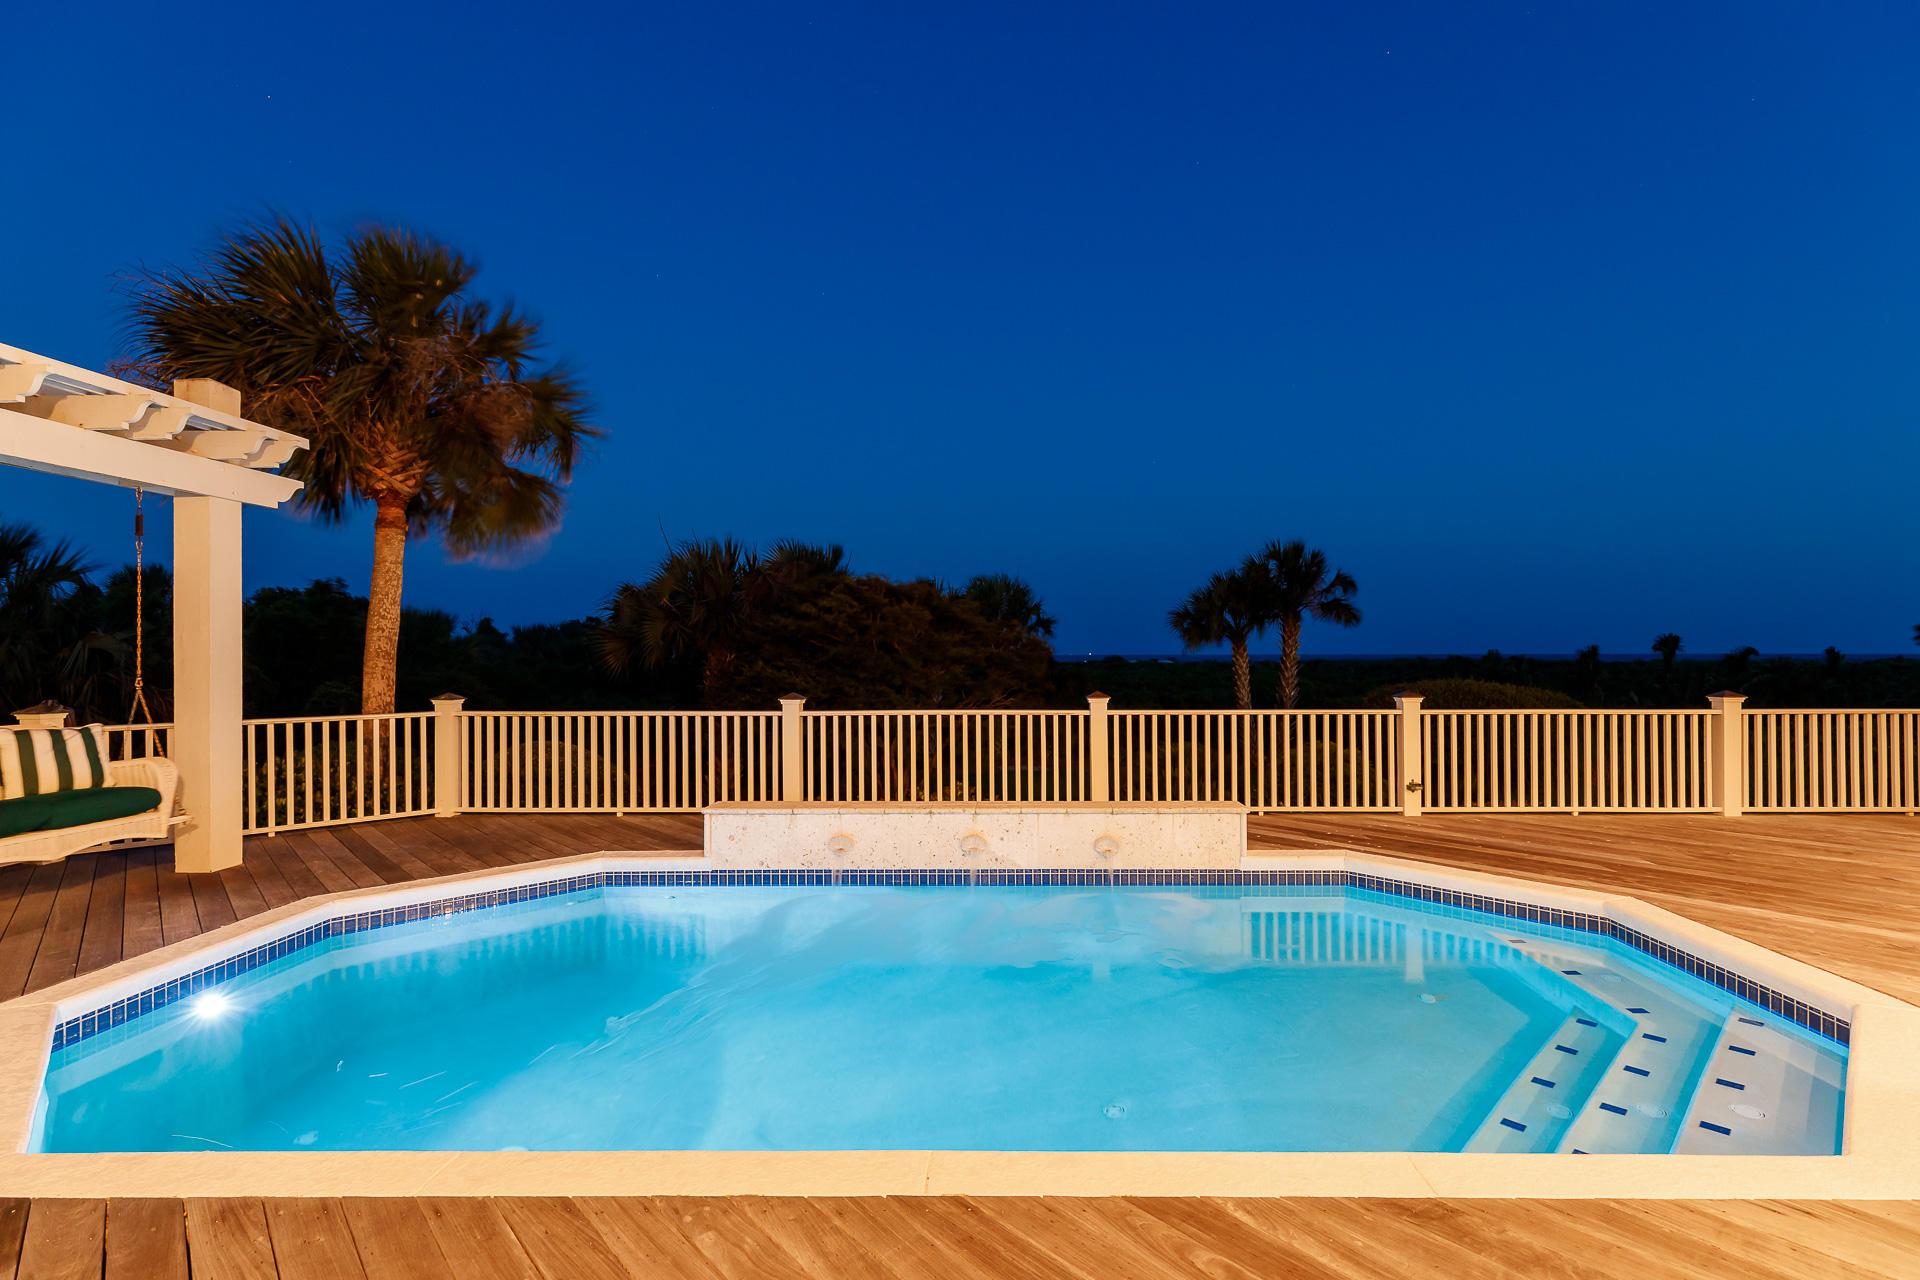 Seabrook Island Homes For Sale - 2216 Rolling Dune, Seabrook Island, SC - 12